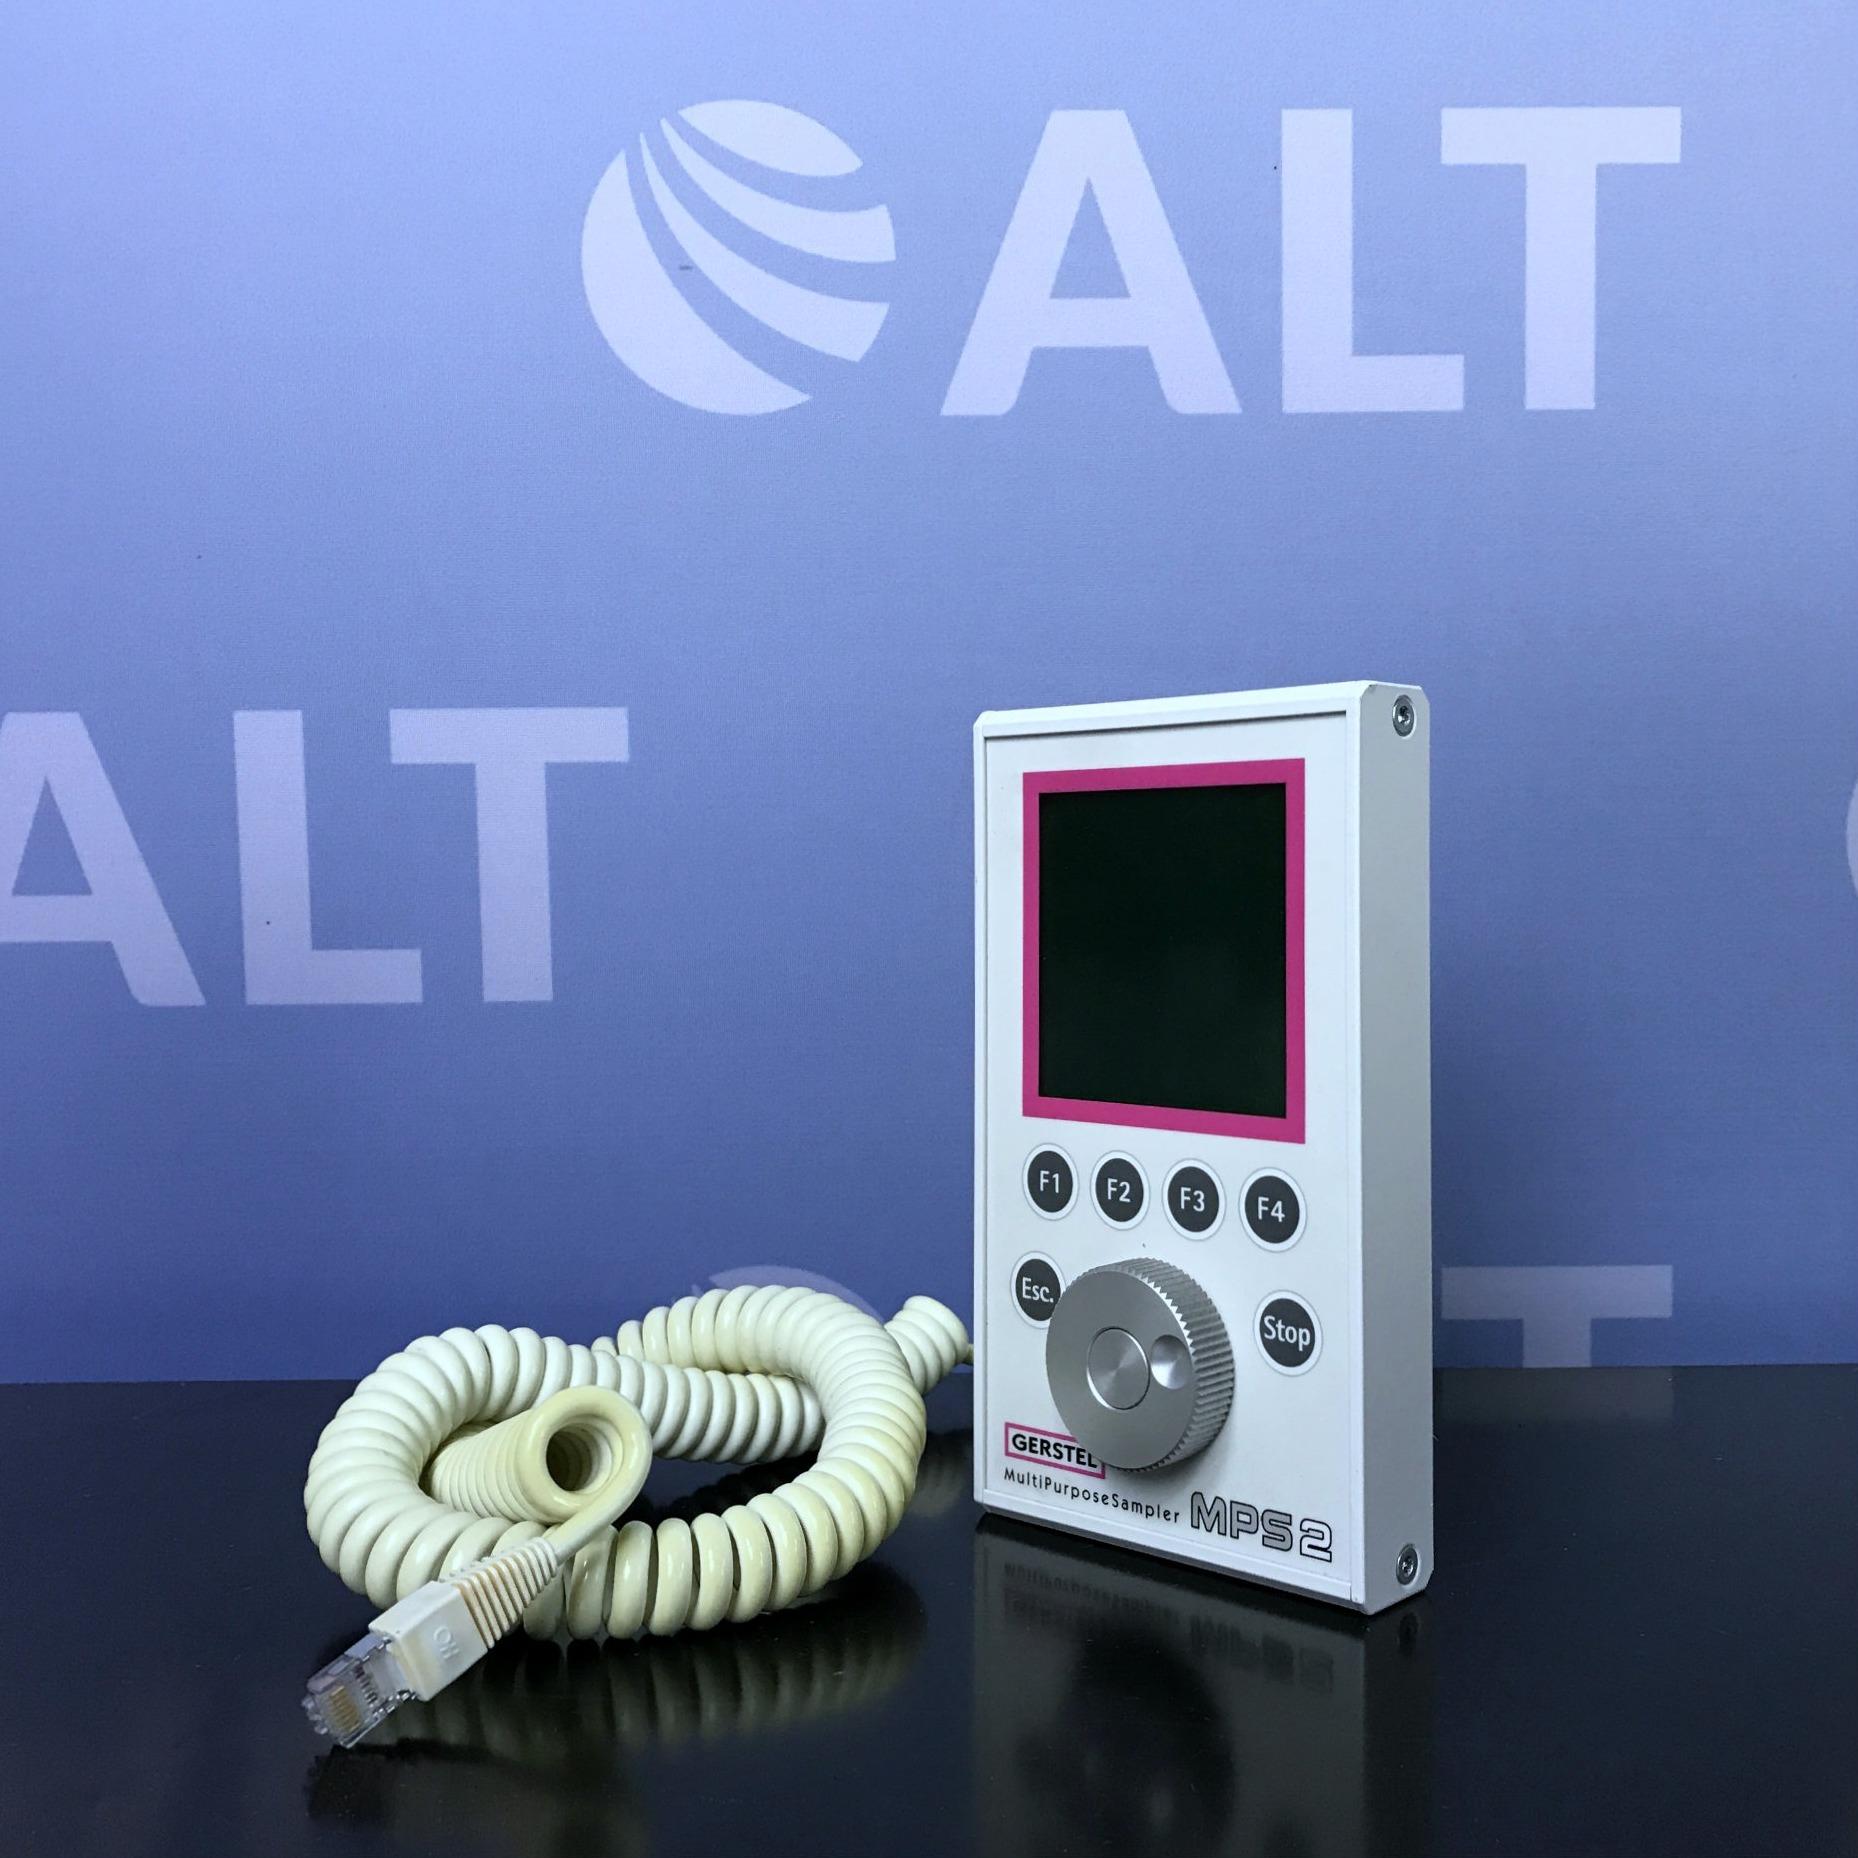 Agilent Technologies GC Sampler 80 Image